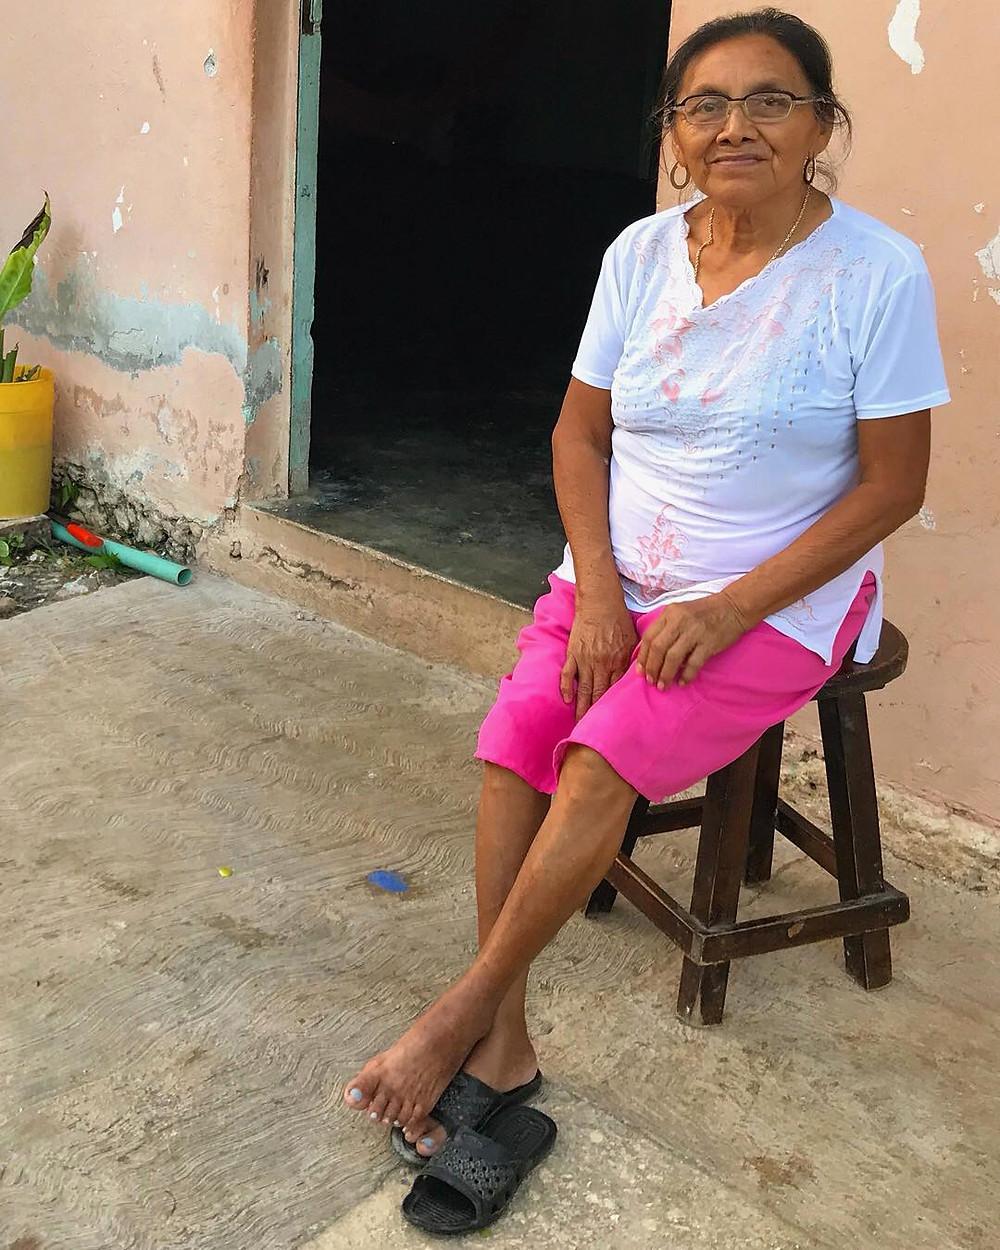 Quintana Roo, Yucatán, animal sanctuary, ethical travel, megan frye